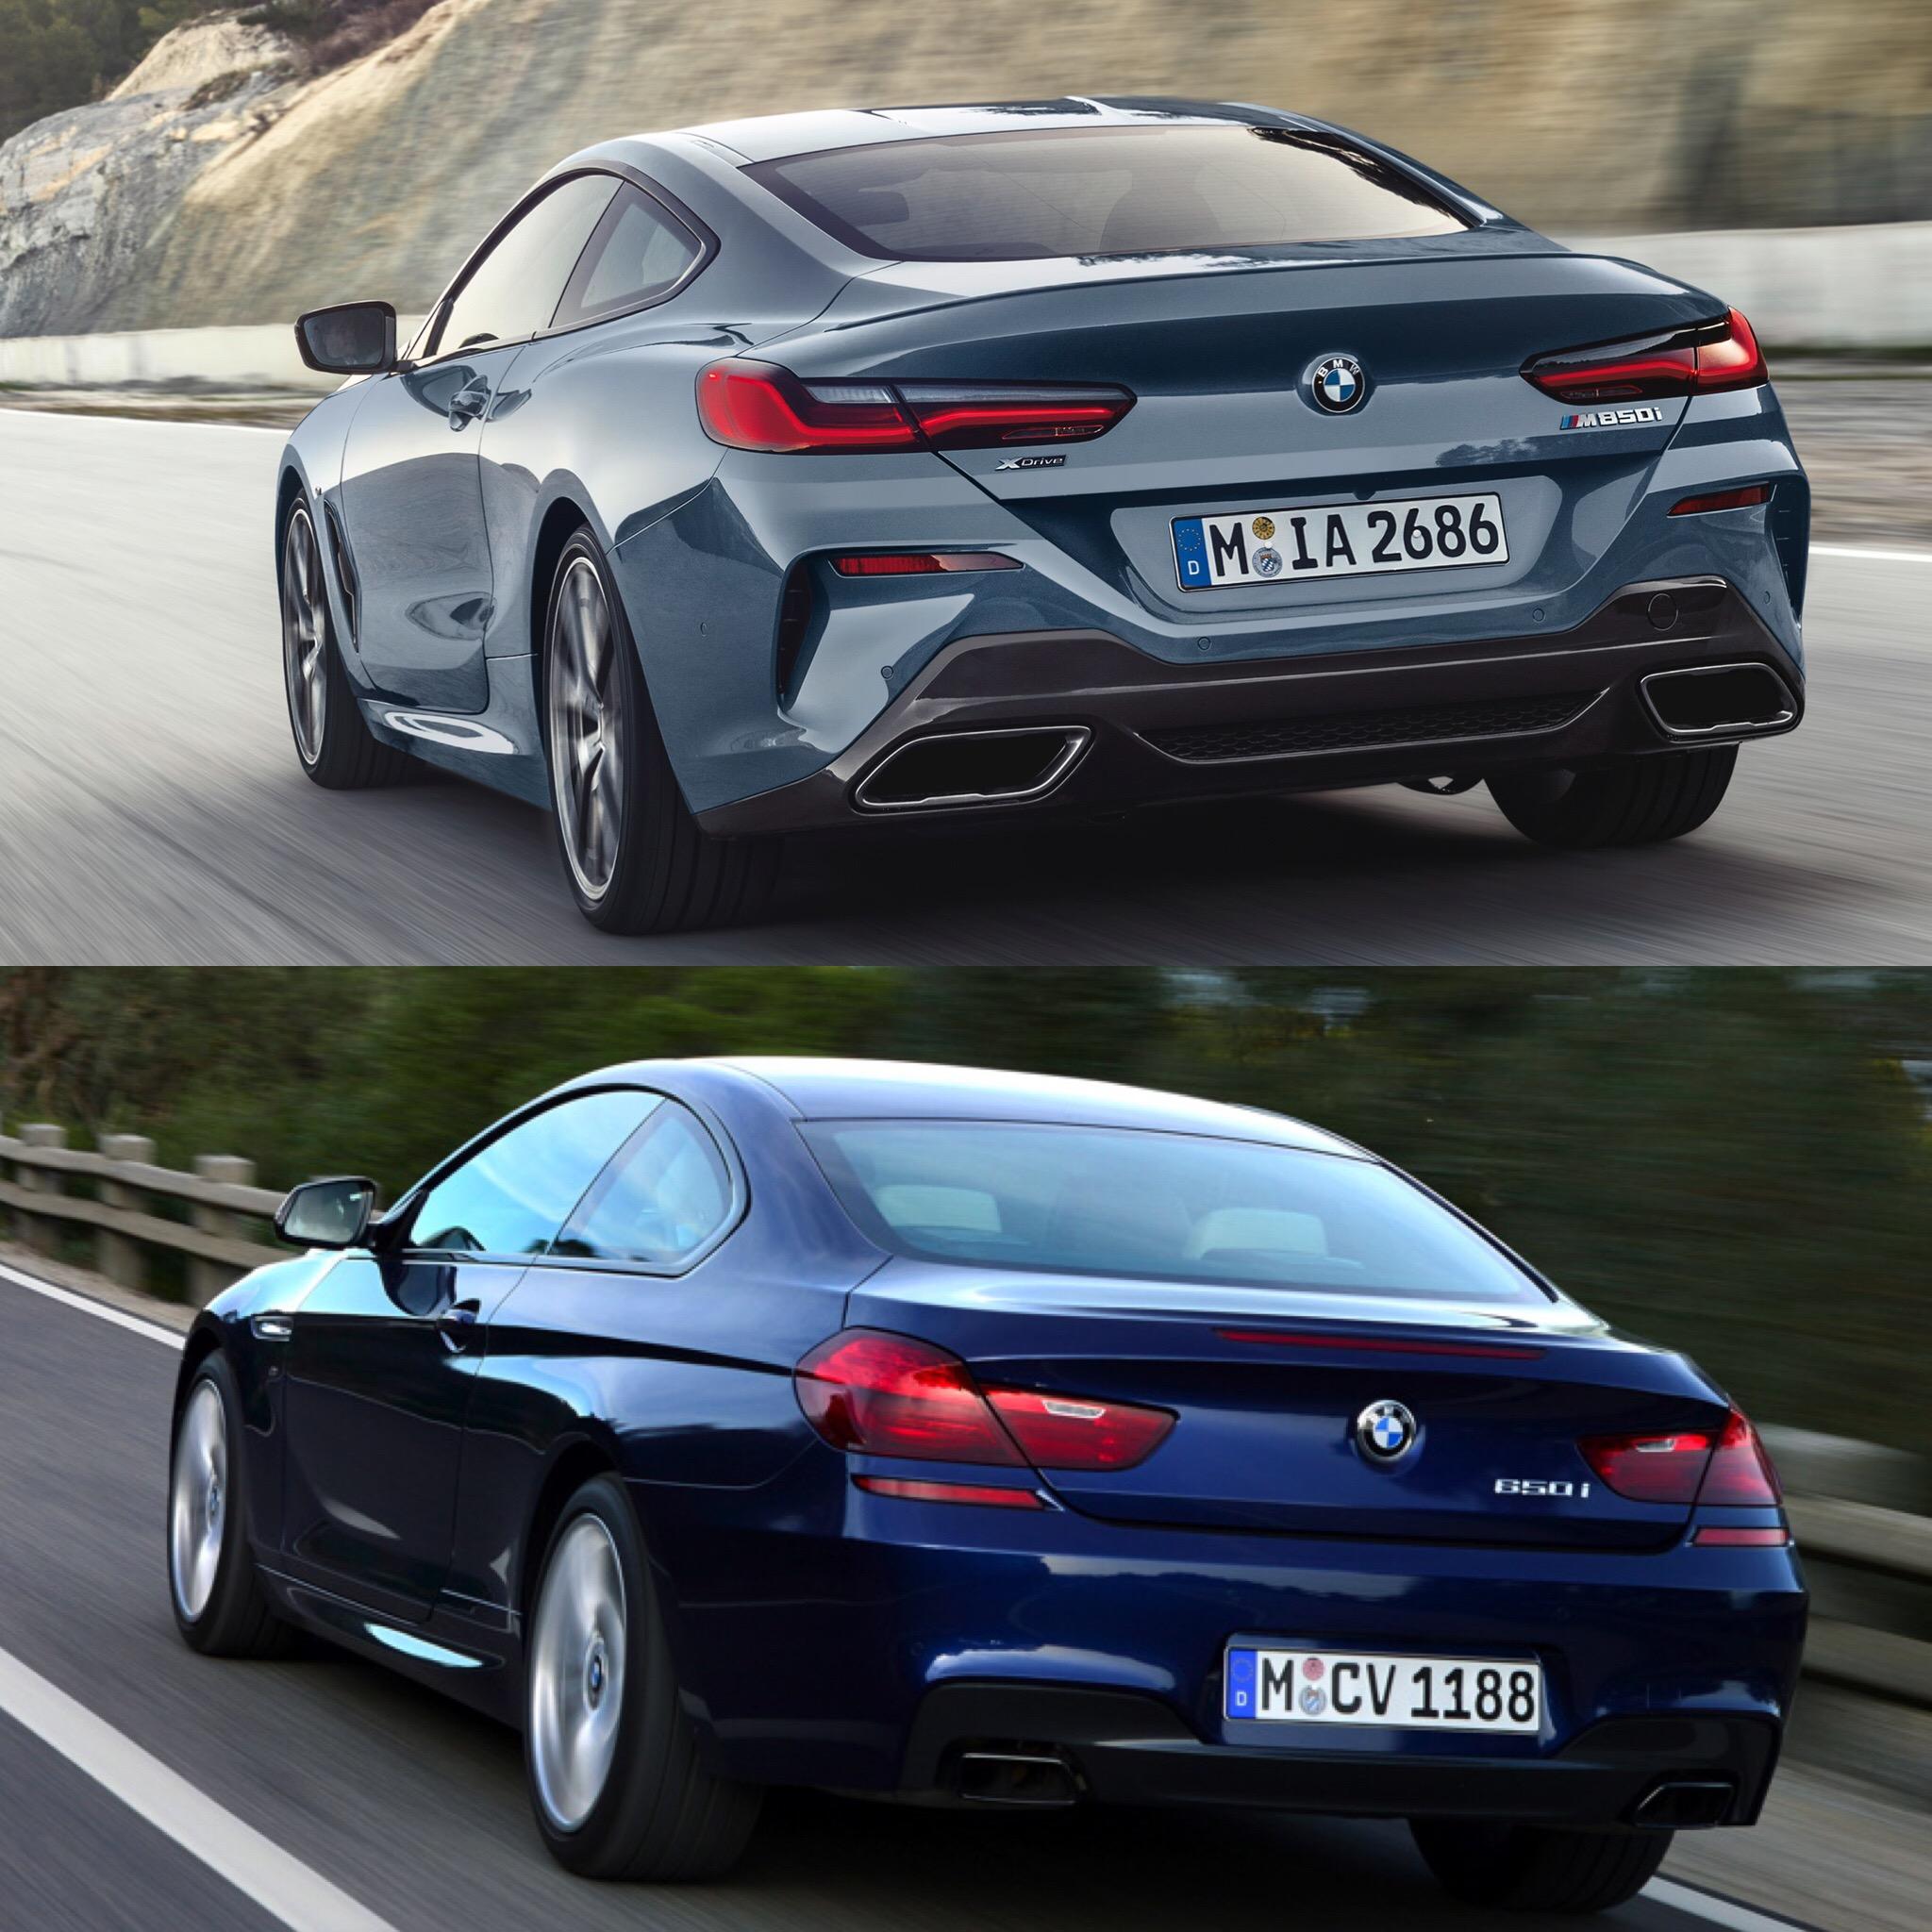 4 Series Vs 6 Series Concept: Photo Comparison: BMW 8 Series Vs BMW 6 Series